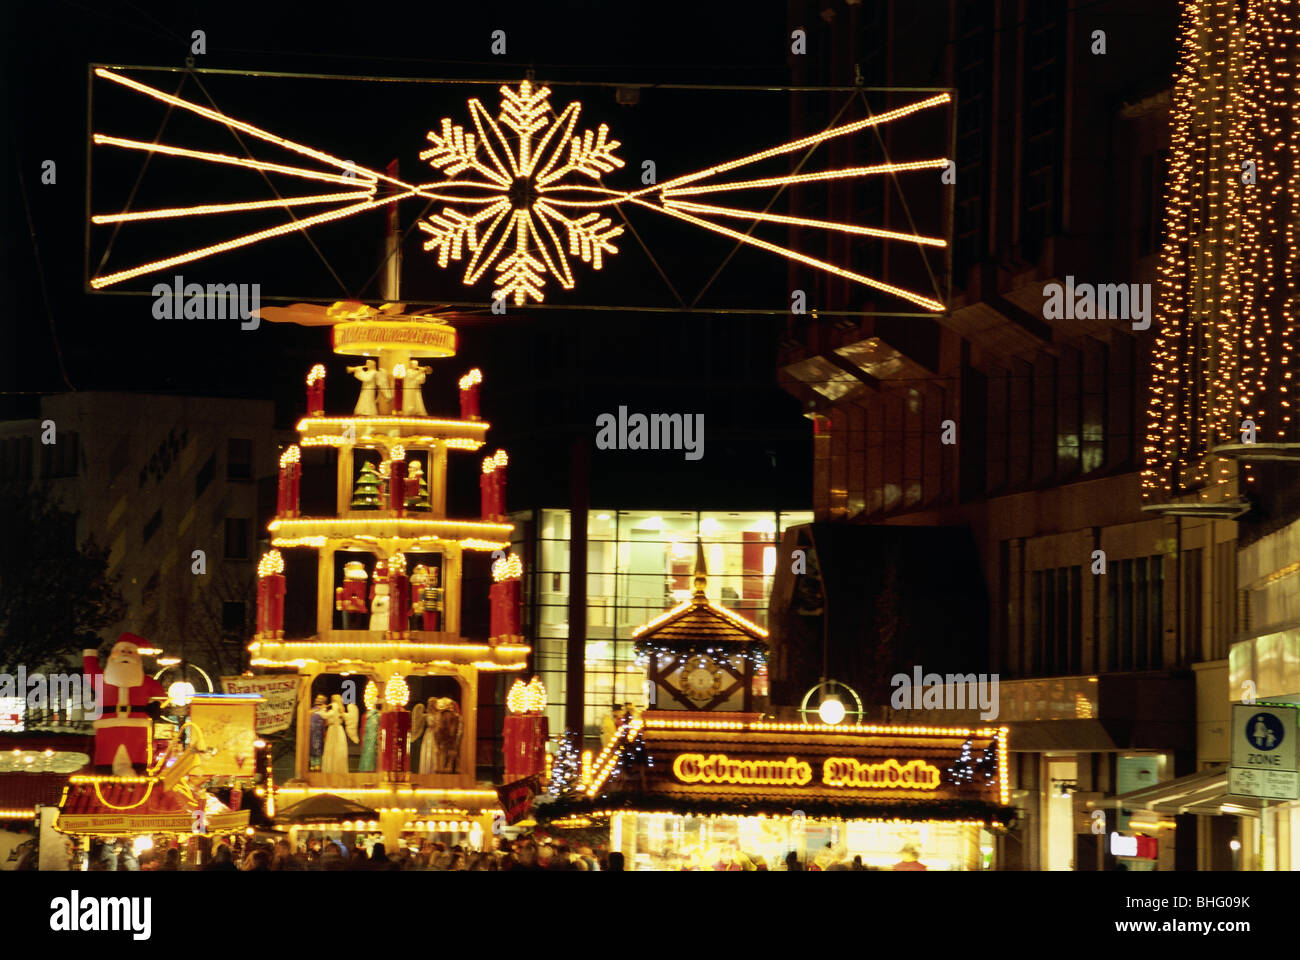 geography / travel, Germany, North Rhine-Westphalia, Dortmund, markets, Christmas market, pyramid, night shot, Additional - Stock Image